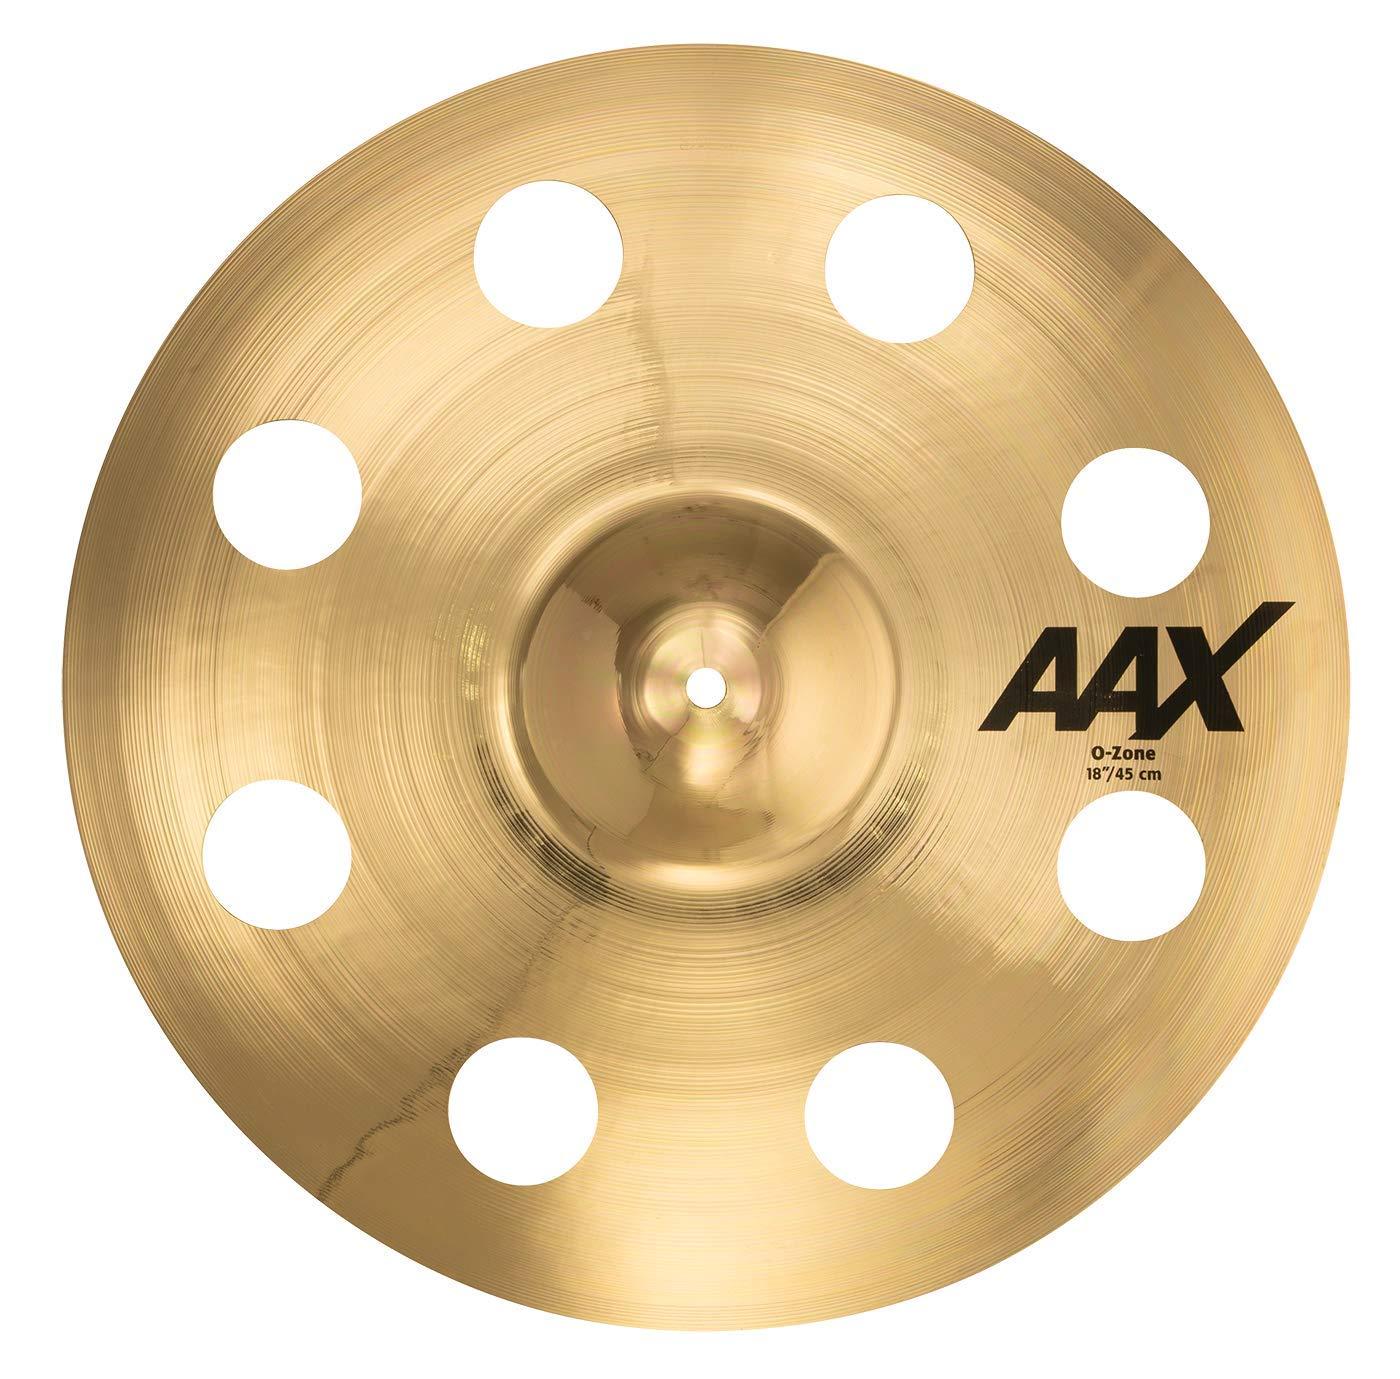 "Sabian AAX 18"" O-Zone Crash Cymbal, Brilliant Finish, inch (21800XB)"